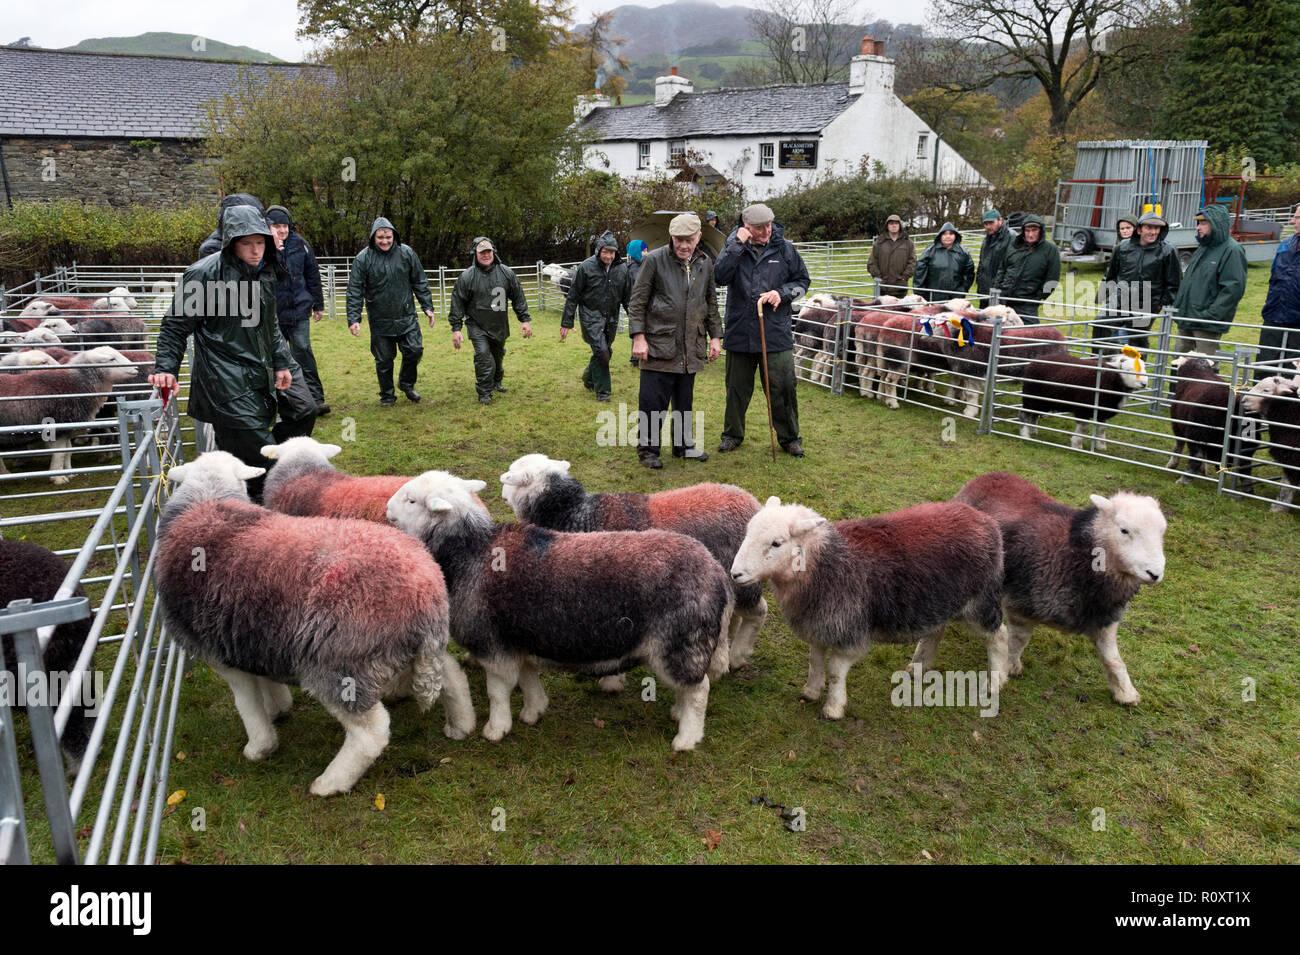 Judging Herdwick sheep, Walna Scar Shepherds Meet, Broughton Mills, Cumbria, November 2018. A traditional annual Lake District sheep show. Stock Photo